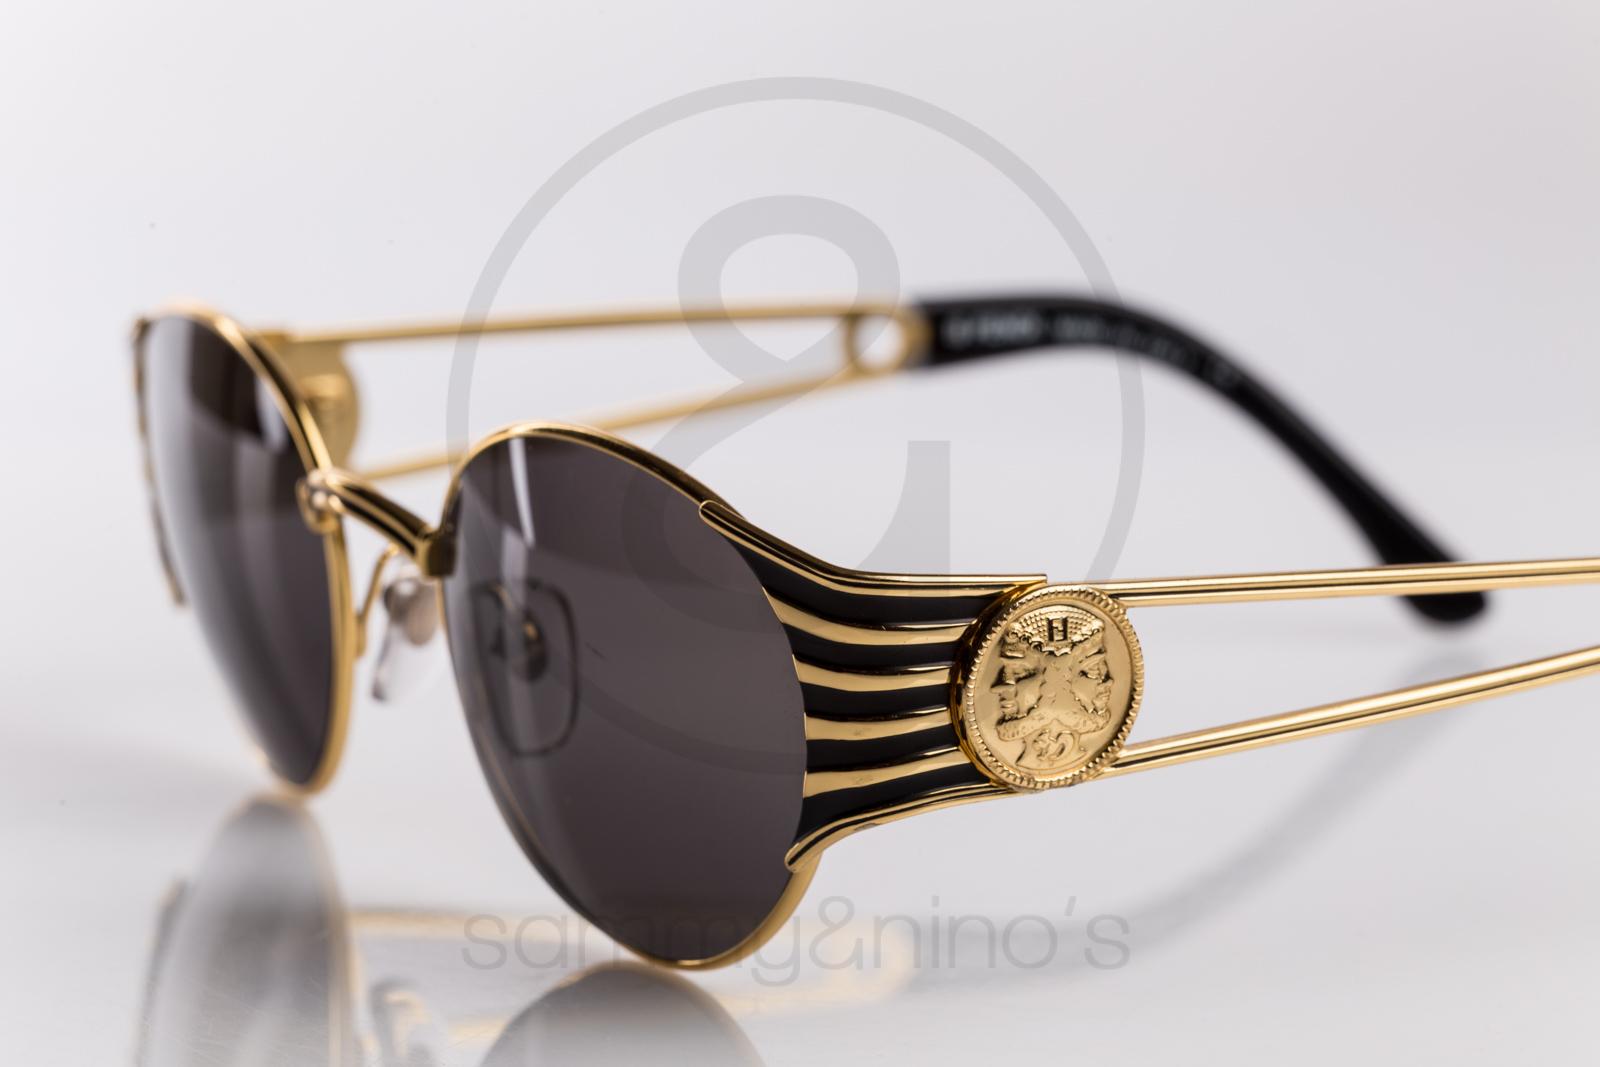 0a40d47c910 Fendi sammy nino store jpg 1600x1067 Accessories vintage fendi shades